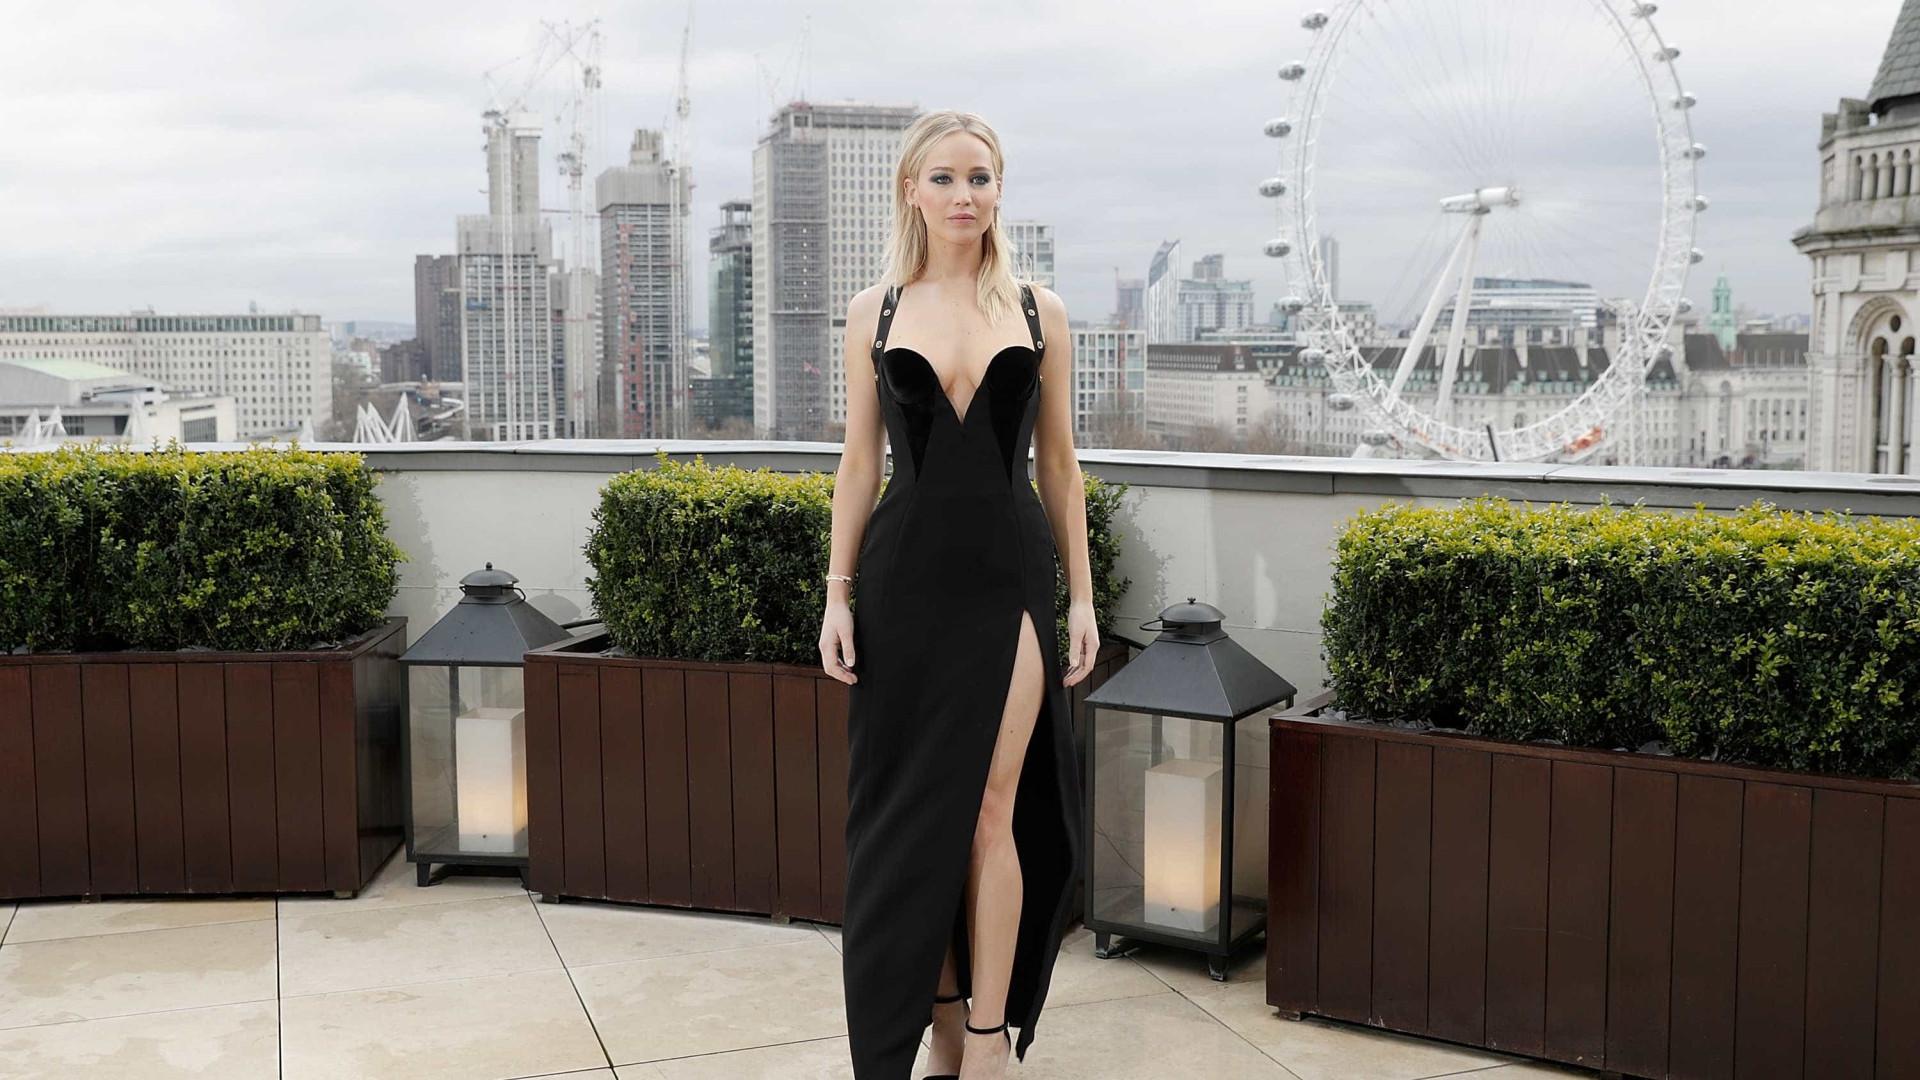 Jennifer Lawrence arrasa no decote em première de filme em Londres